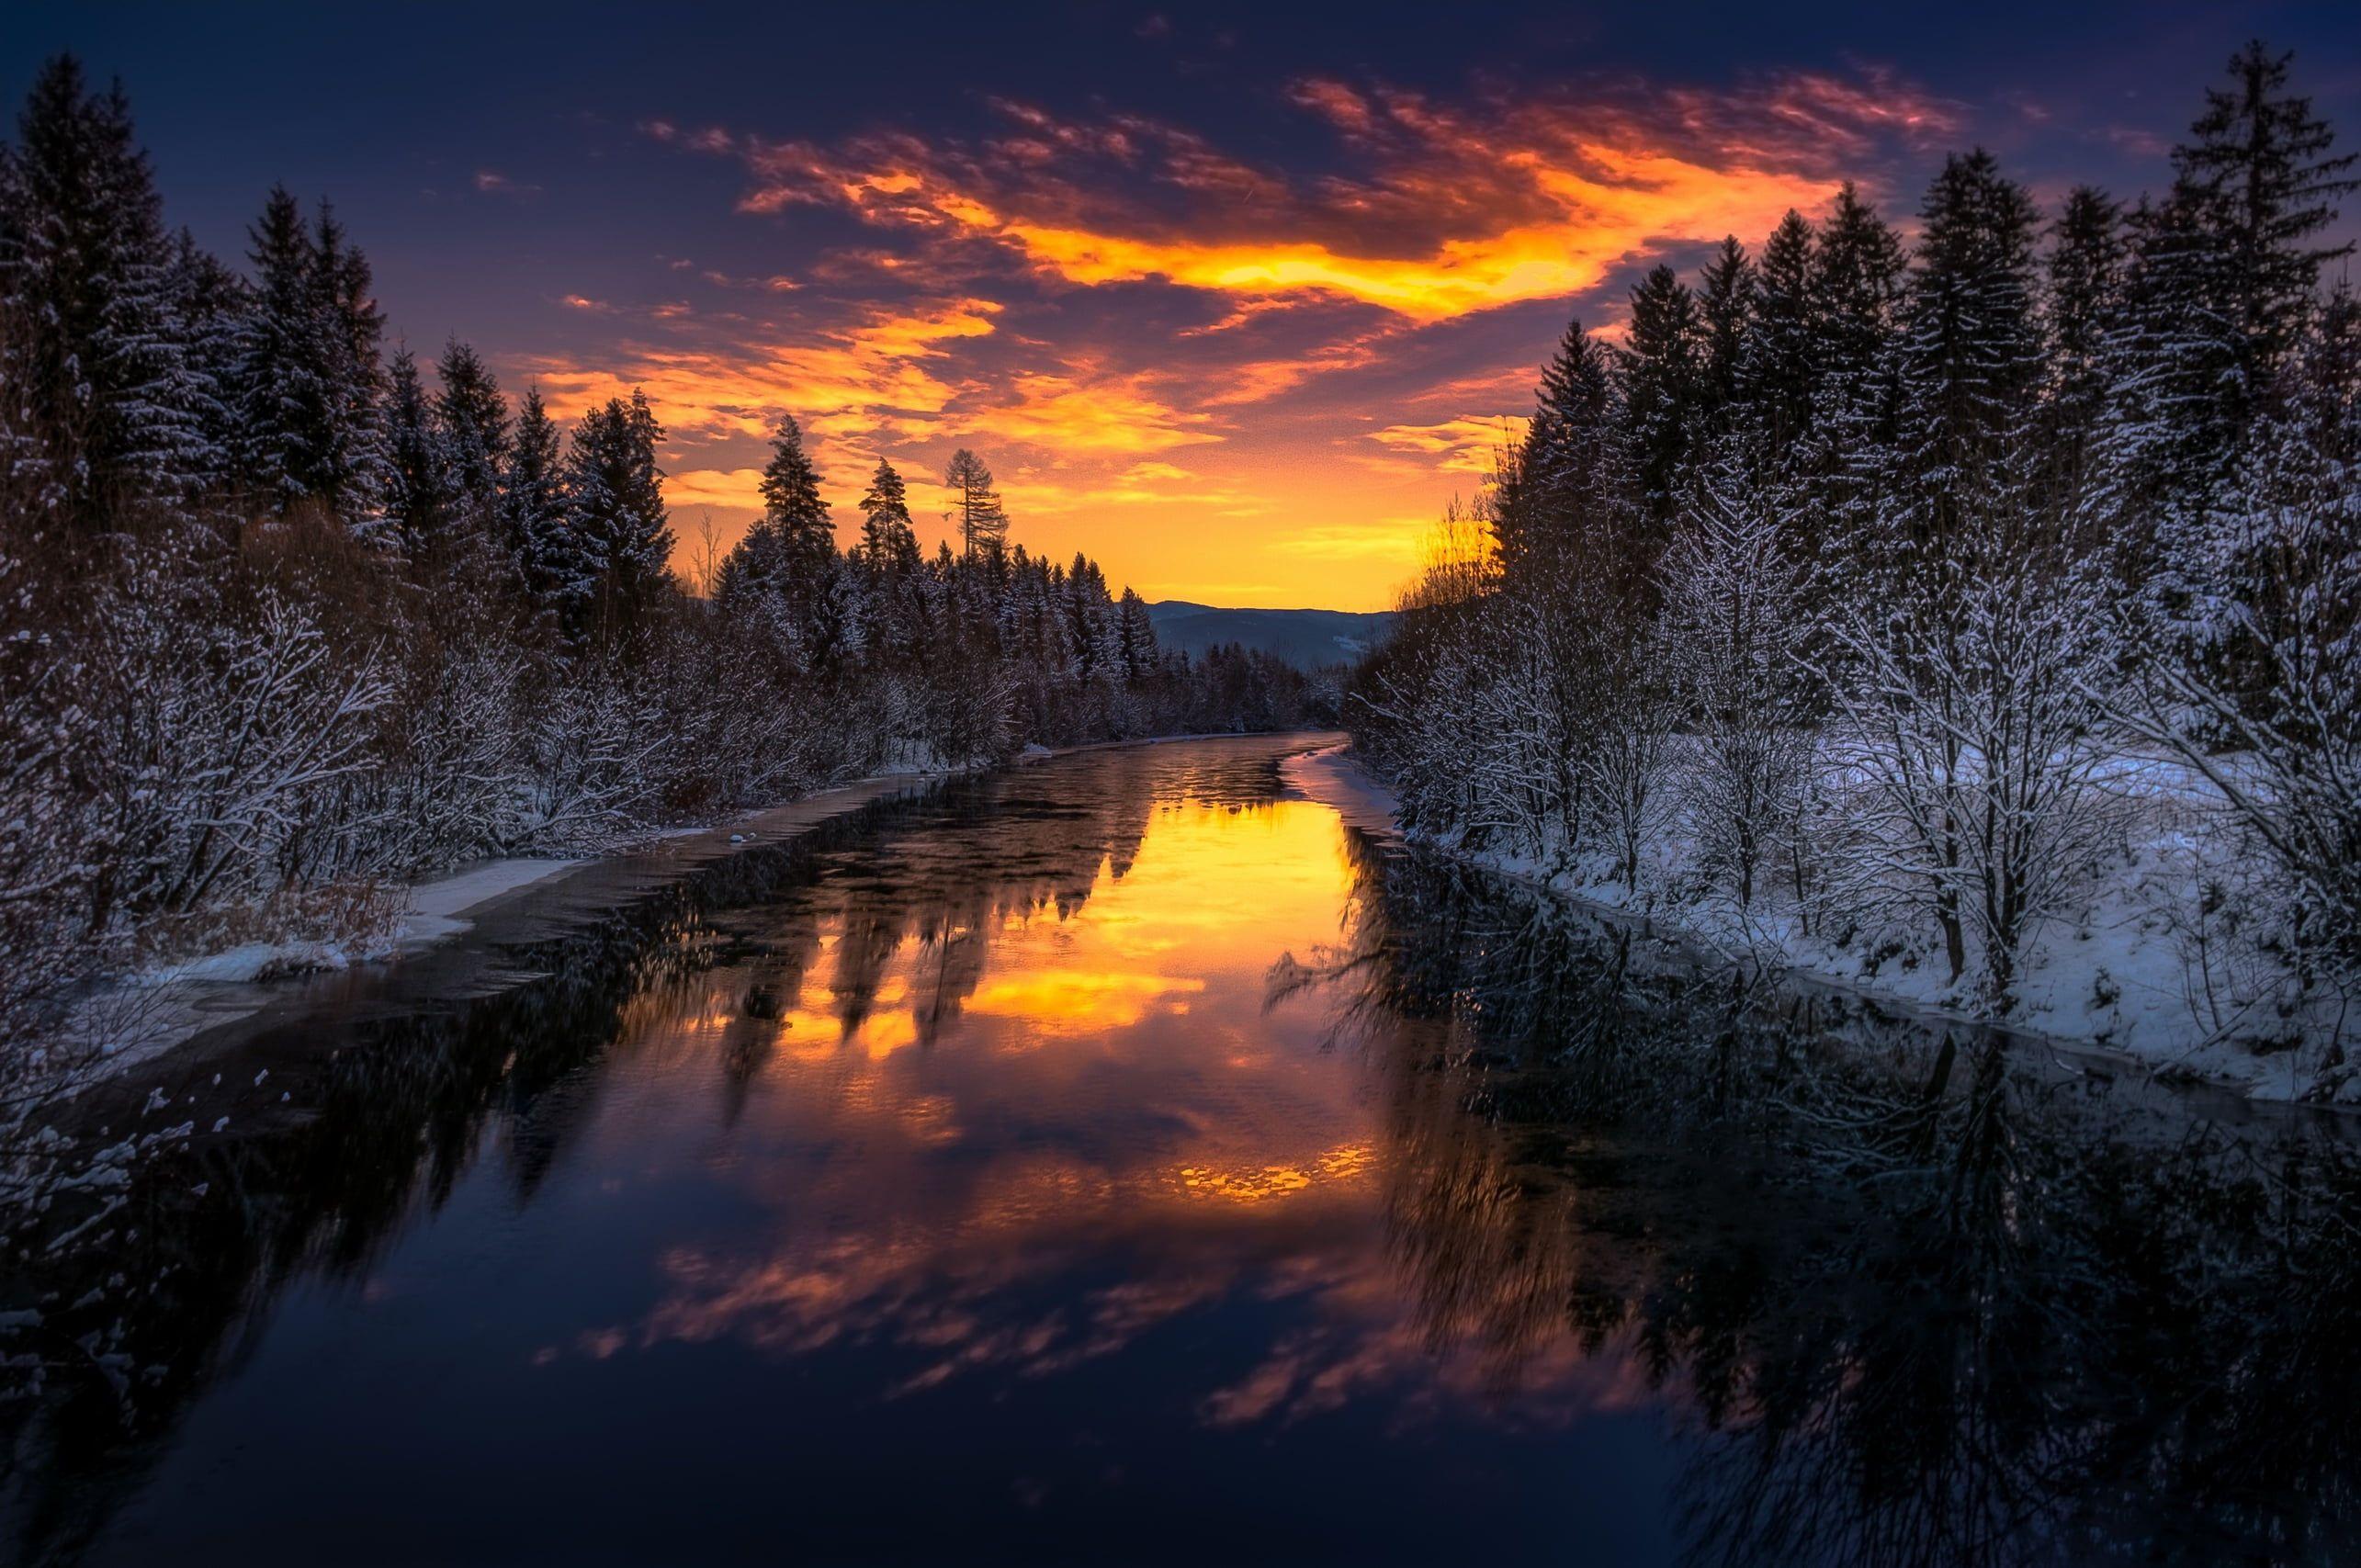 Lake Between Pine Trees, Dark, Landscape, Sky, Sunlight